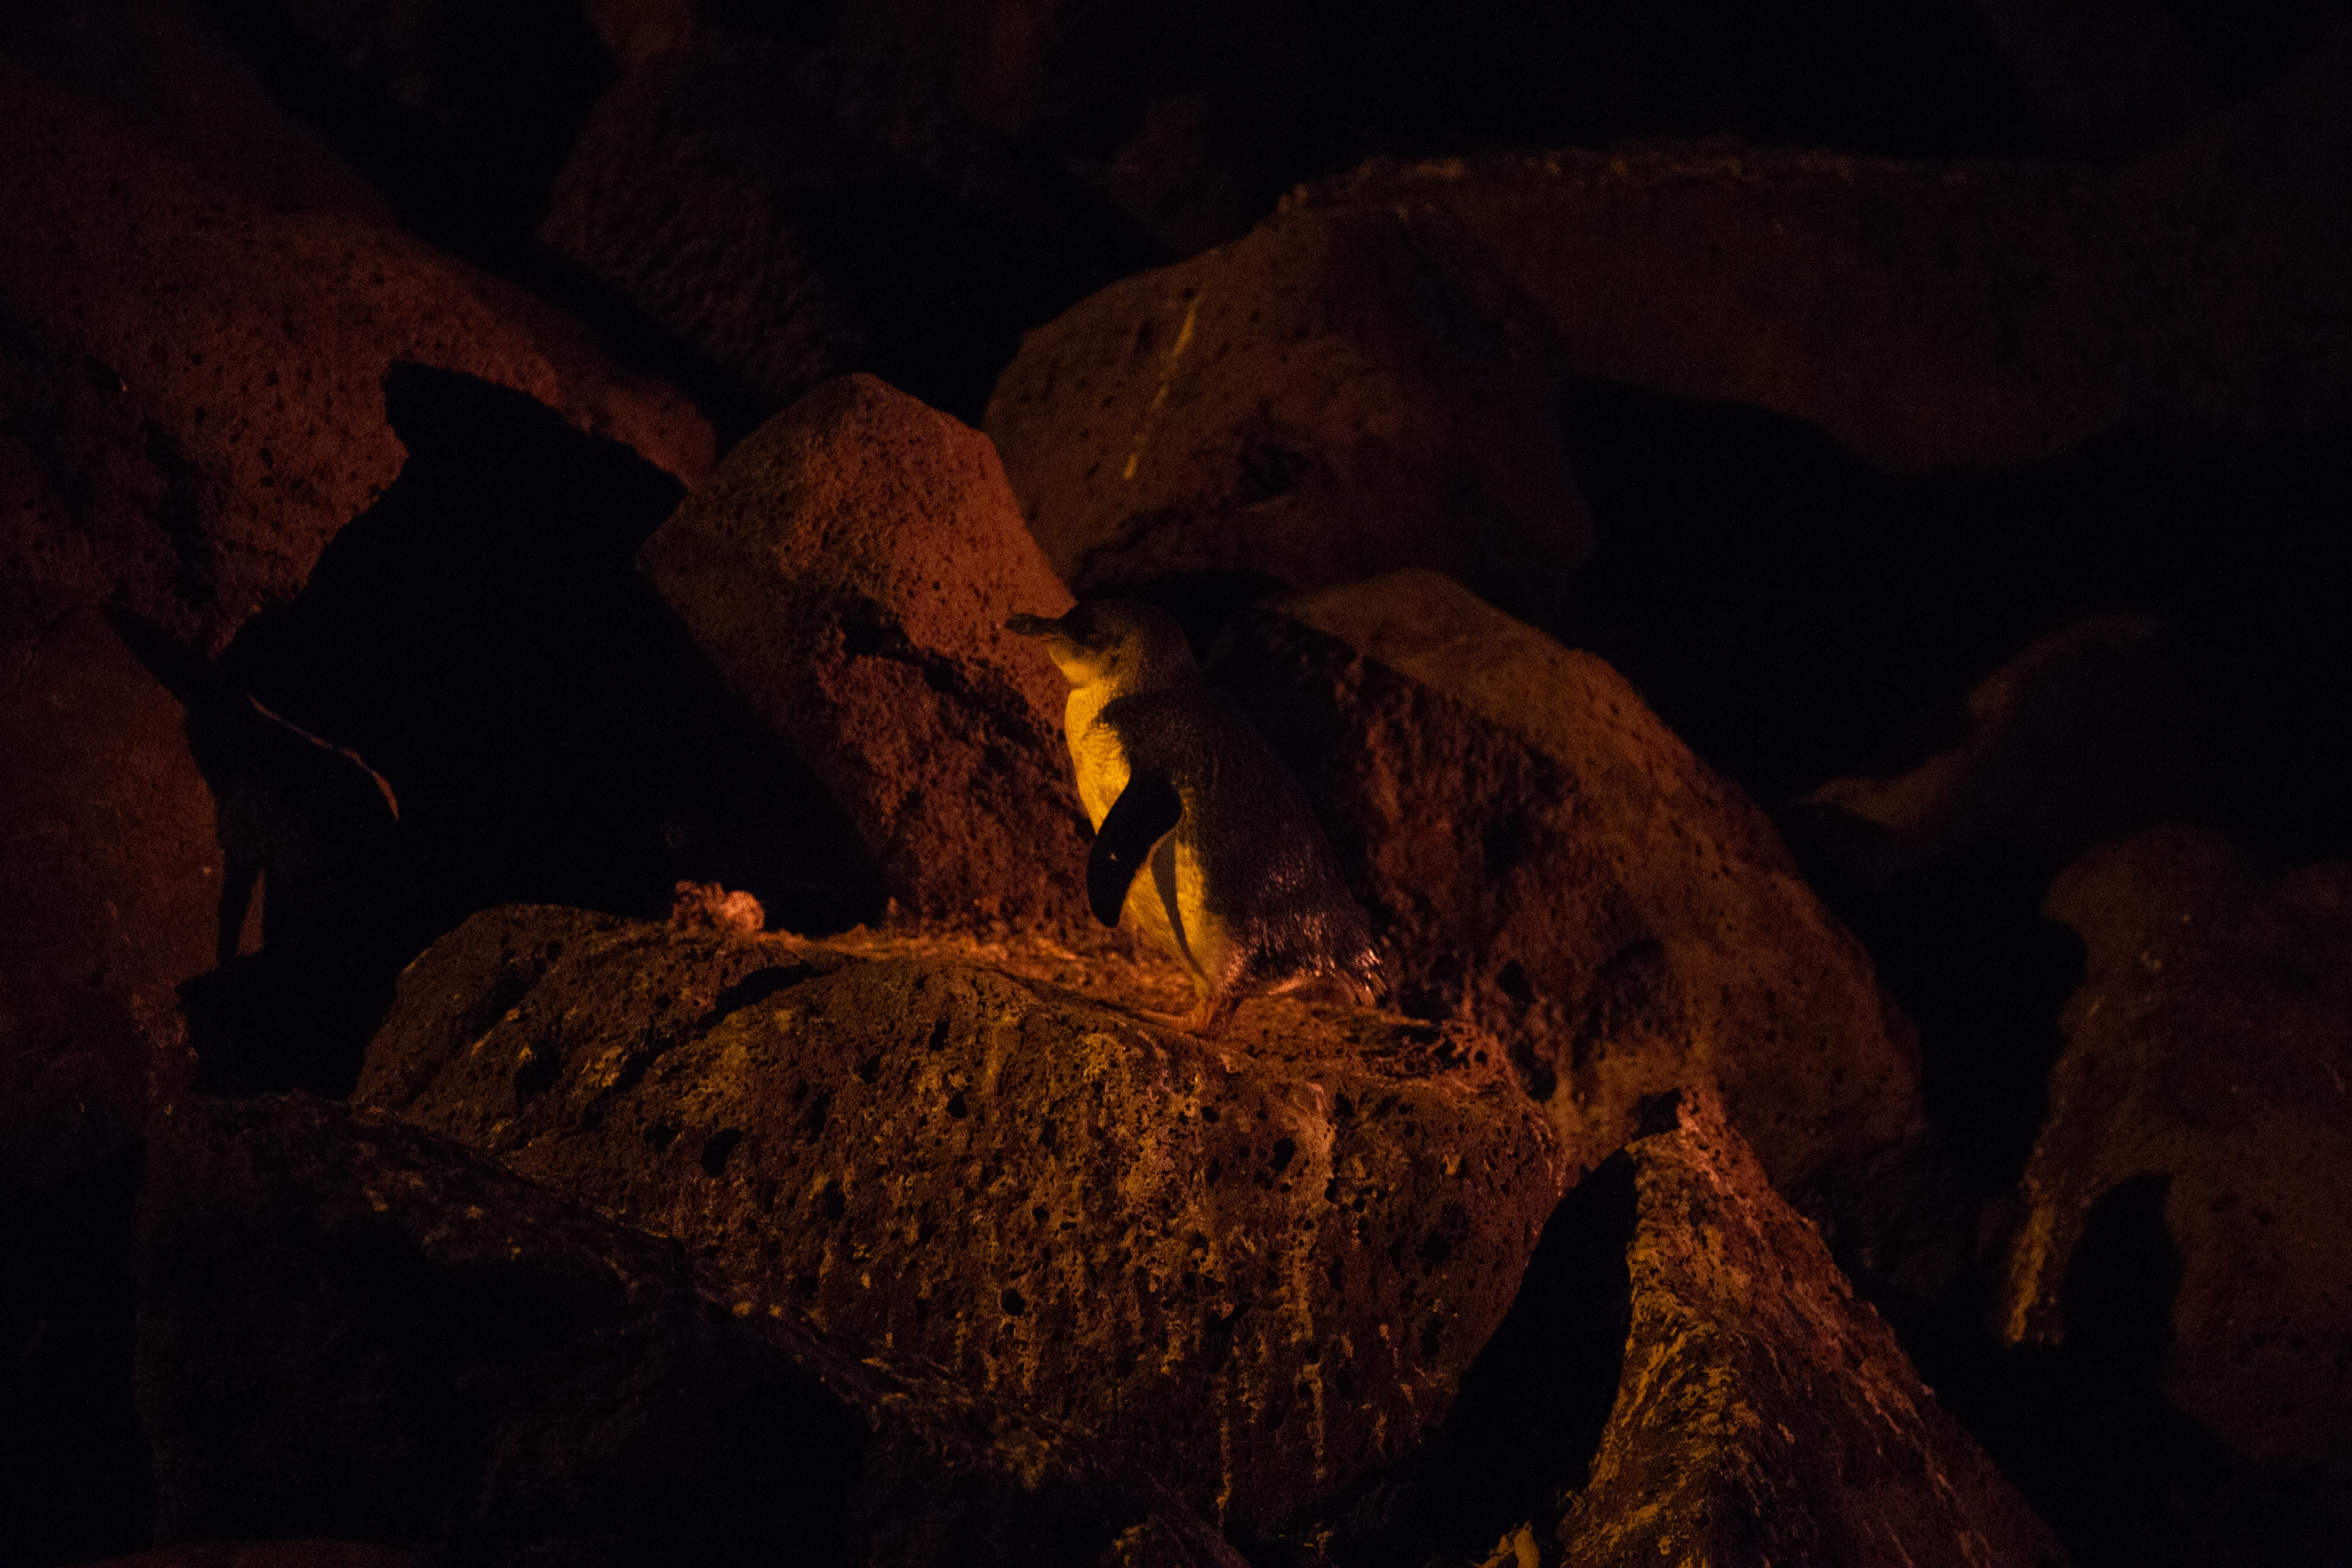 Manchots-St-Kilda-fairy-penguins-8